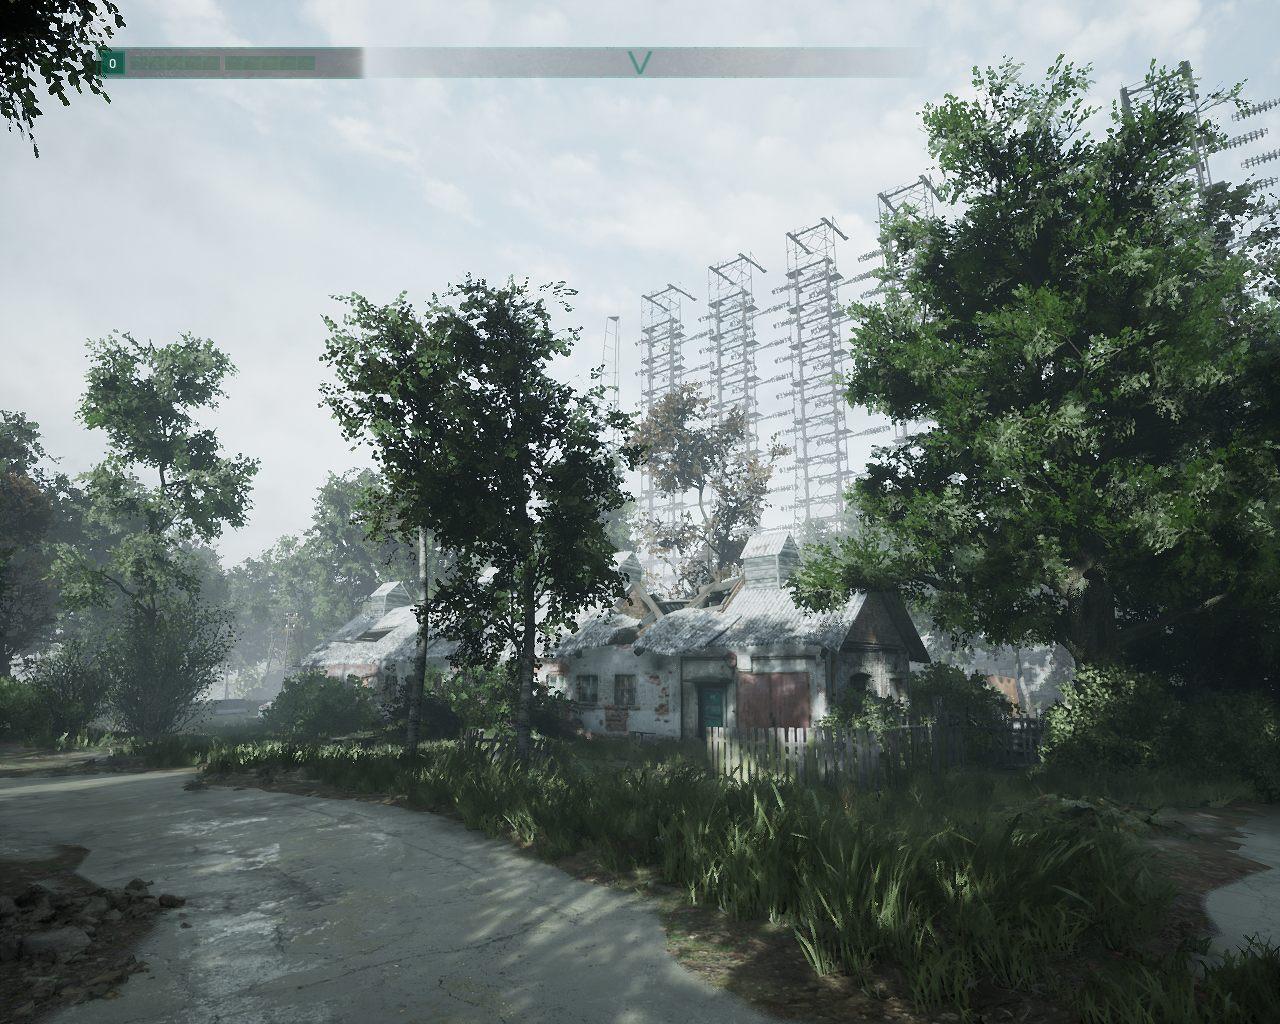 ChernobylGame-Win64-Shipping 2021-07-29 01-38-19-72.bmp.jpg